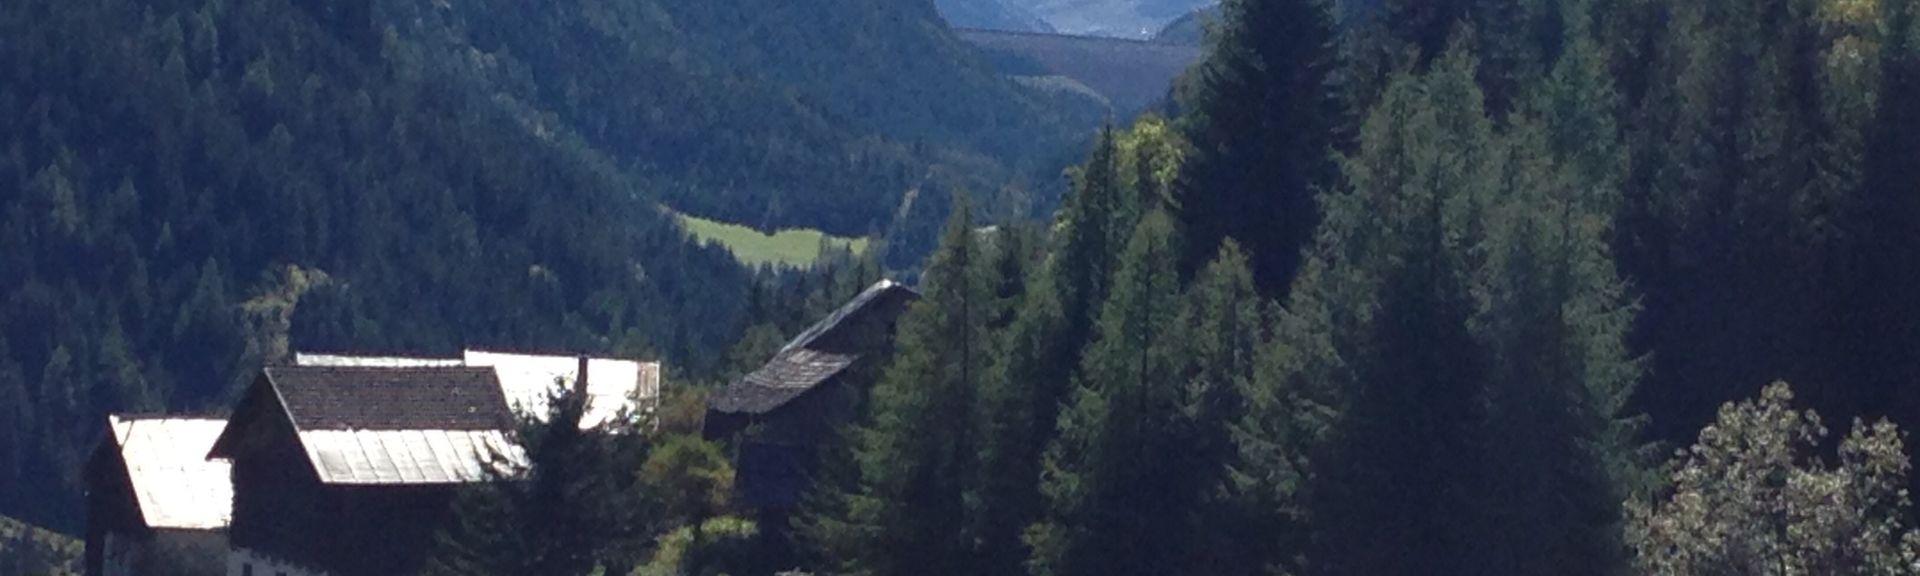 Toesens, Tyrol, Austria